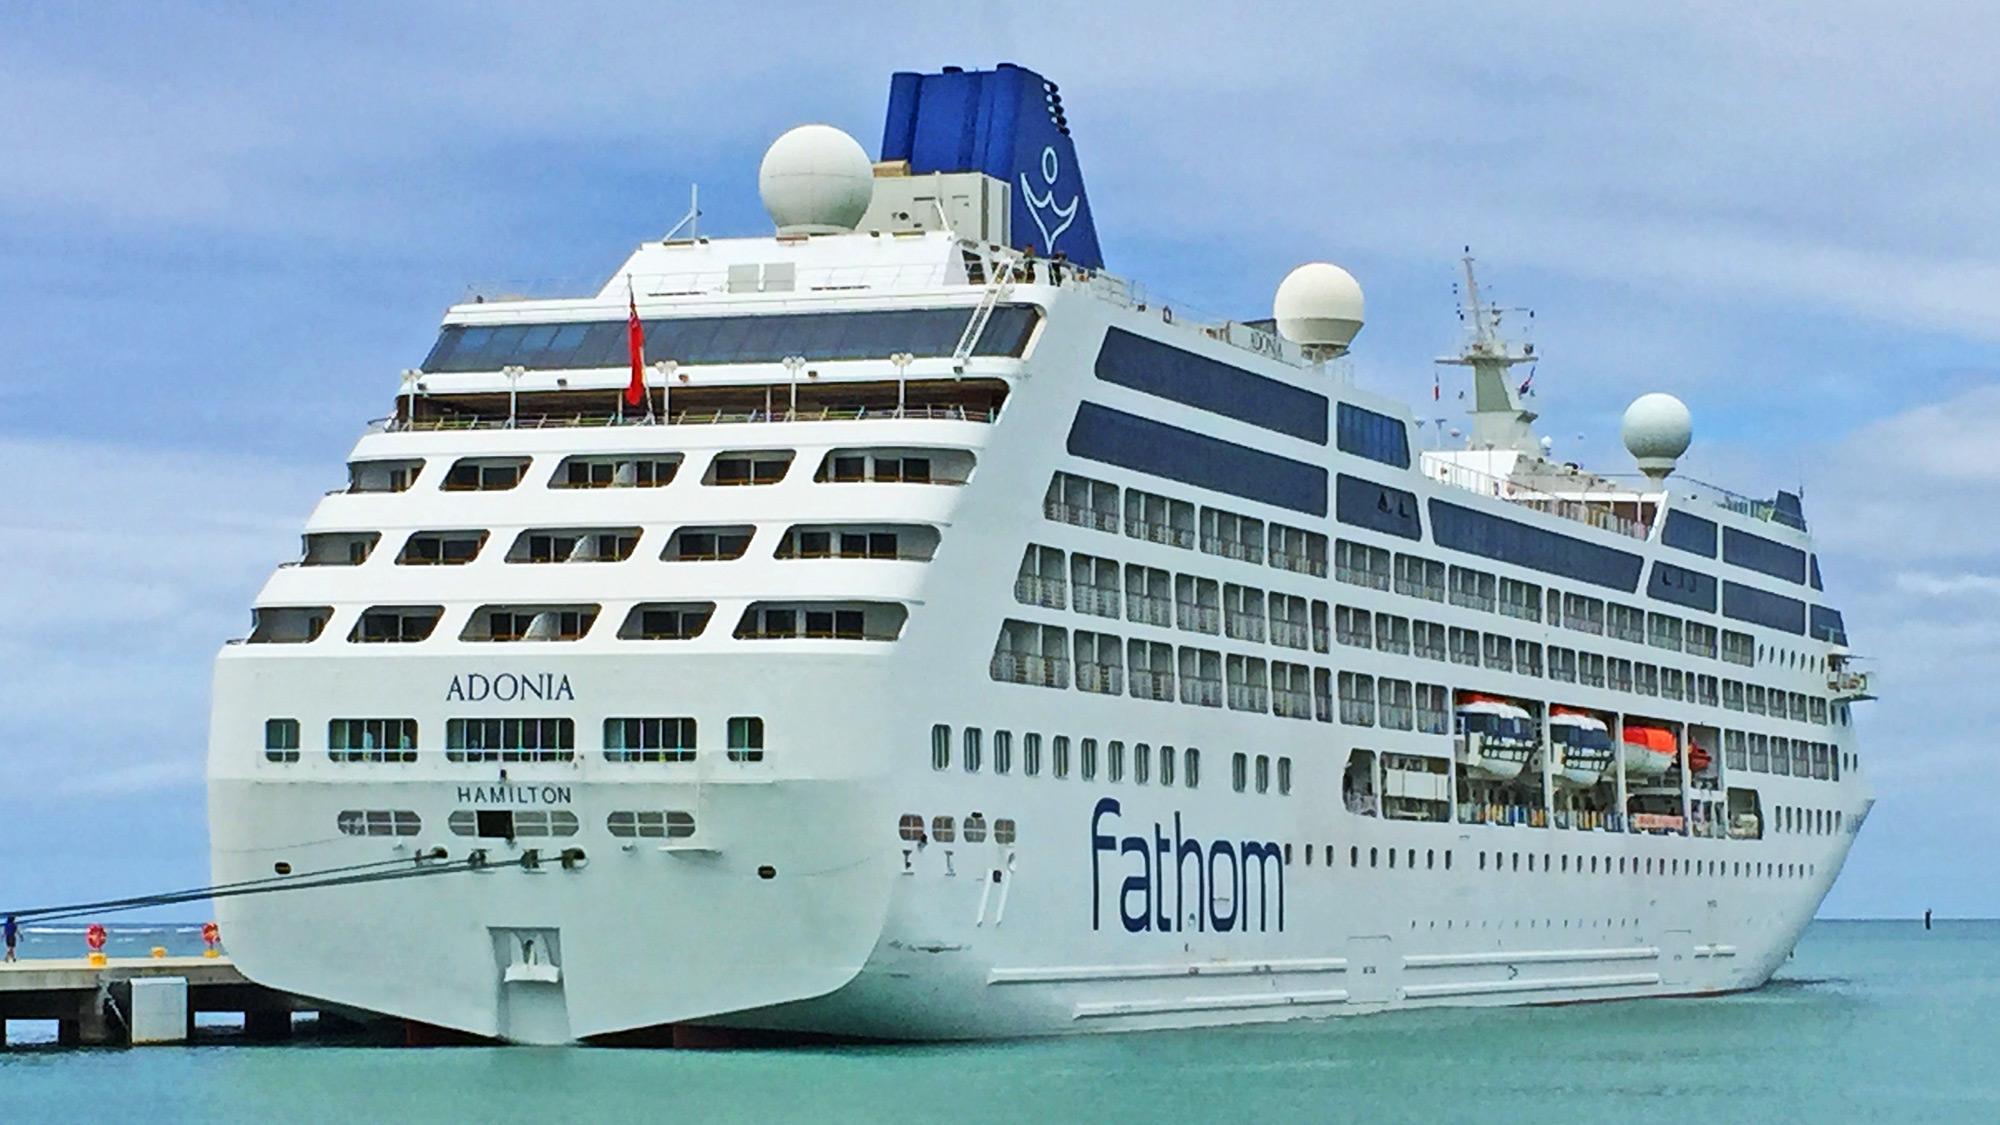 Adonia Cruise Ship Fathom | newhairstylesformen2014.com